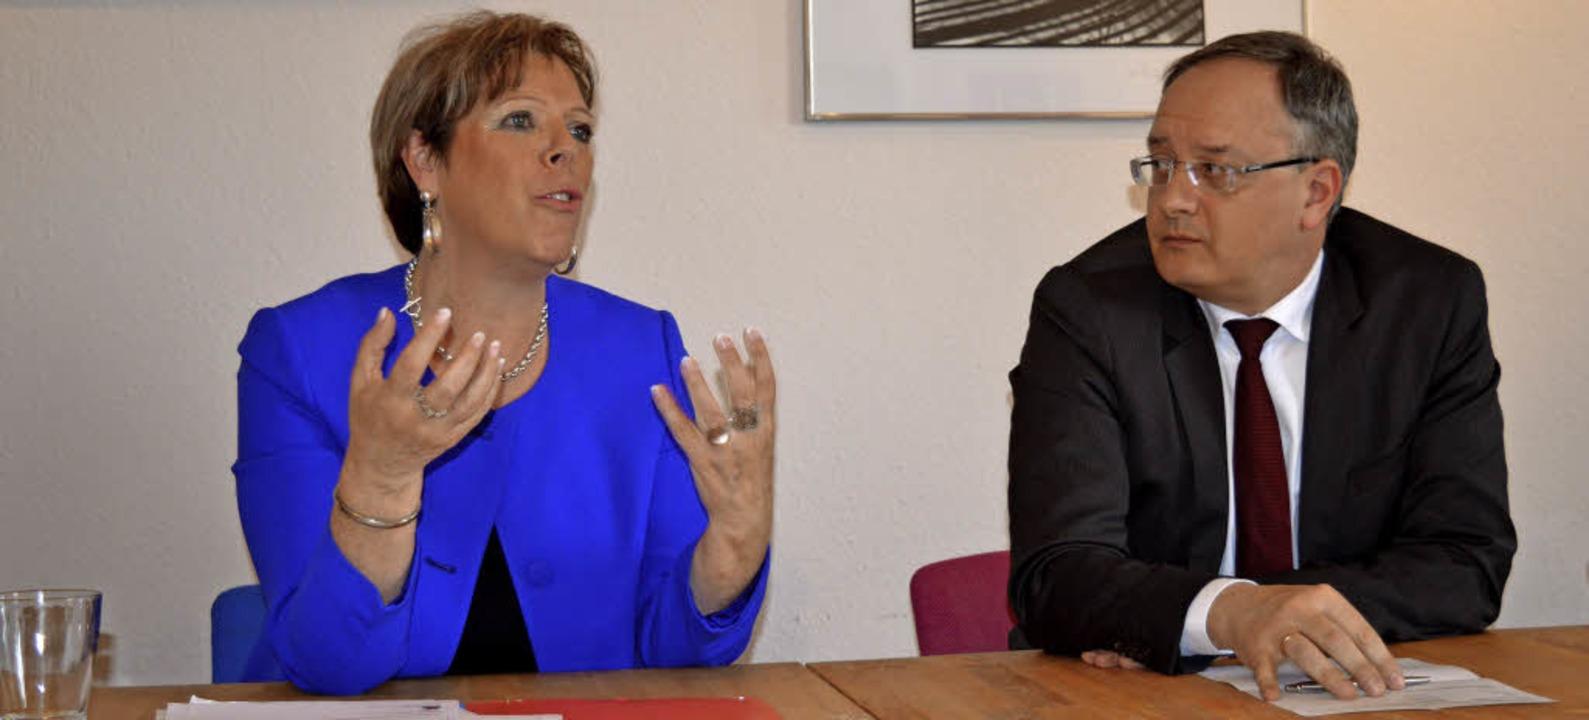 Andreas Stoch, Vorsitzender der SPD-La...in ihrem Wahlkreisbüro in Emmendingen.  | Foto: Andrea Strumberger